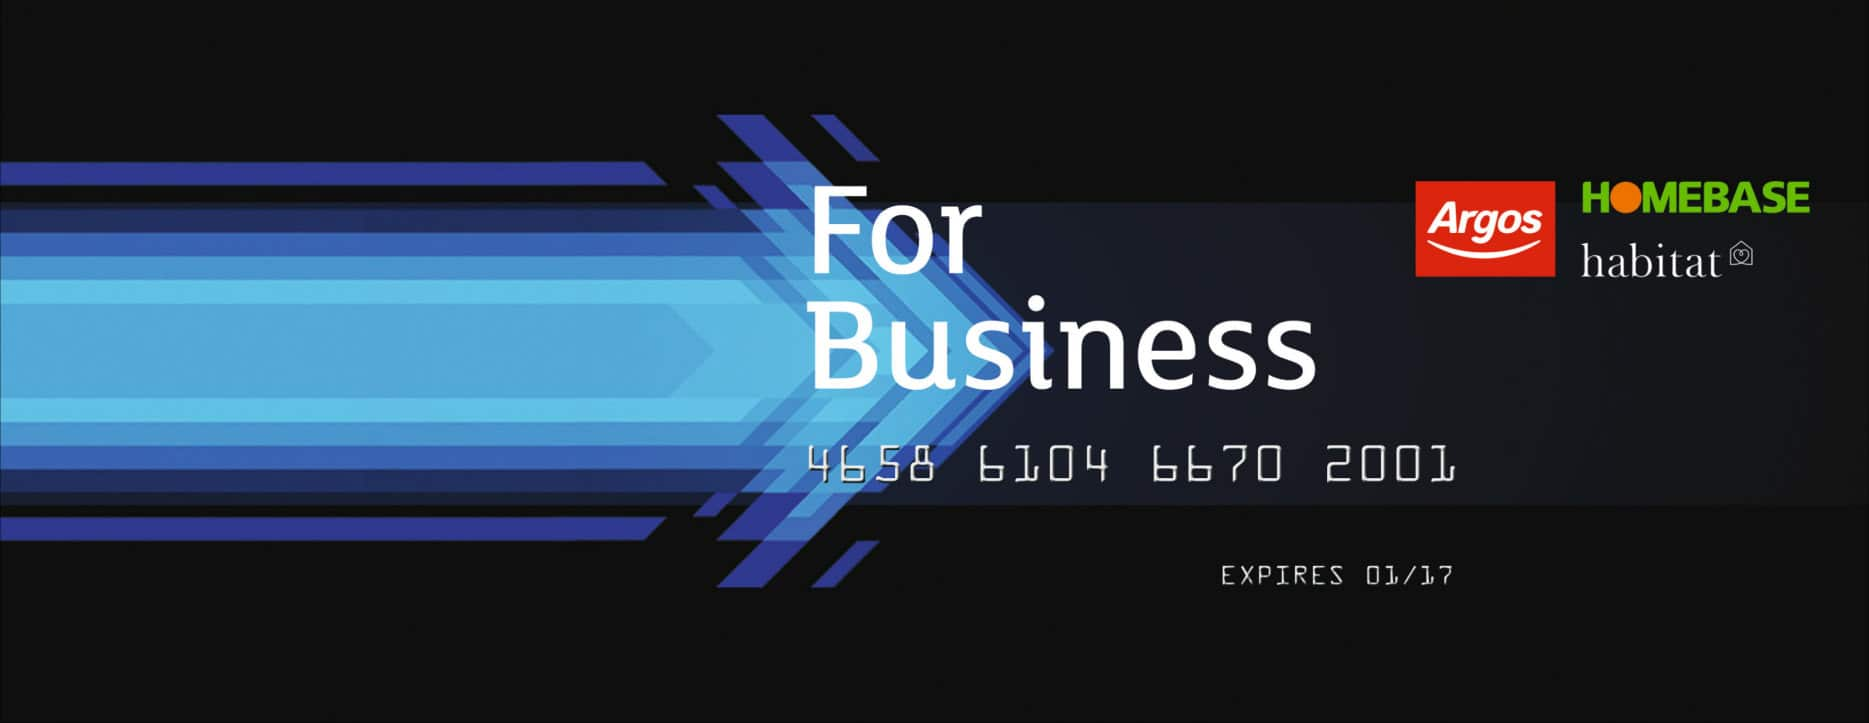 argos-business-main2